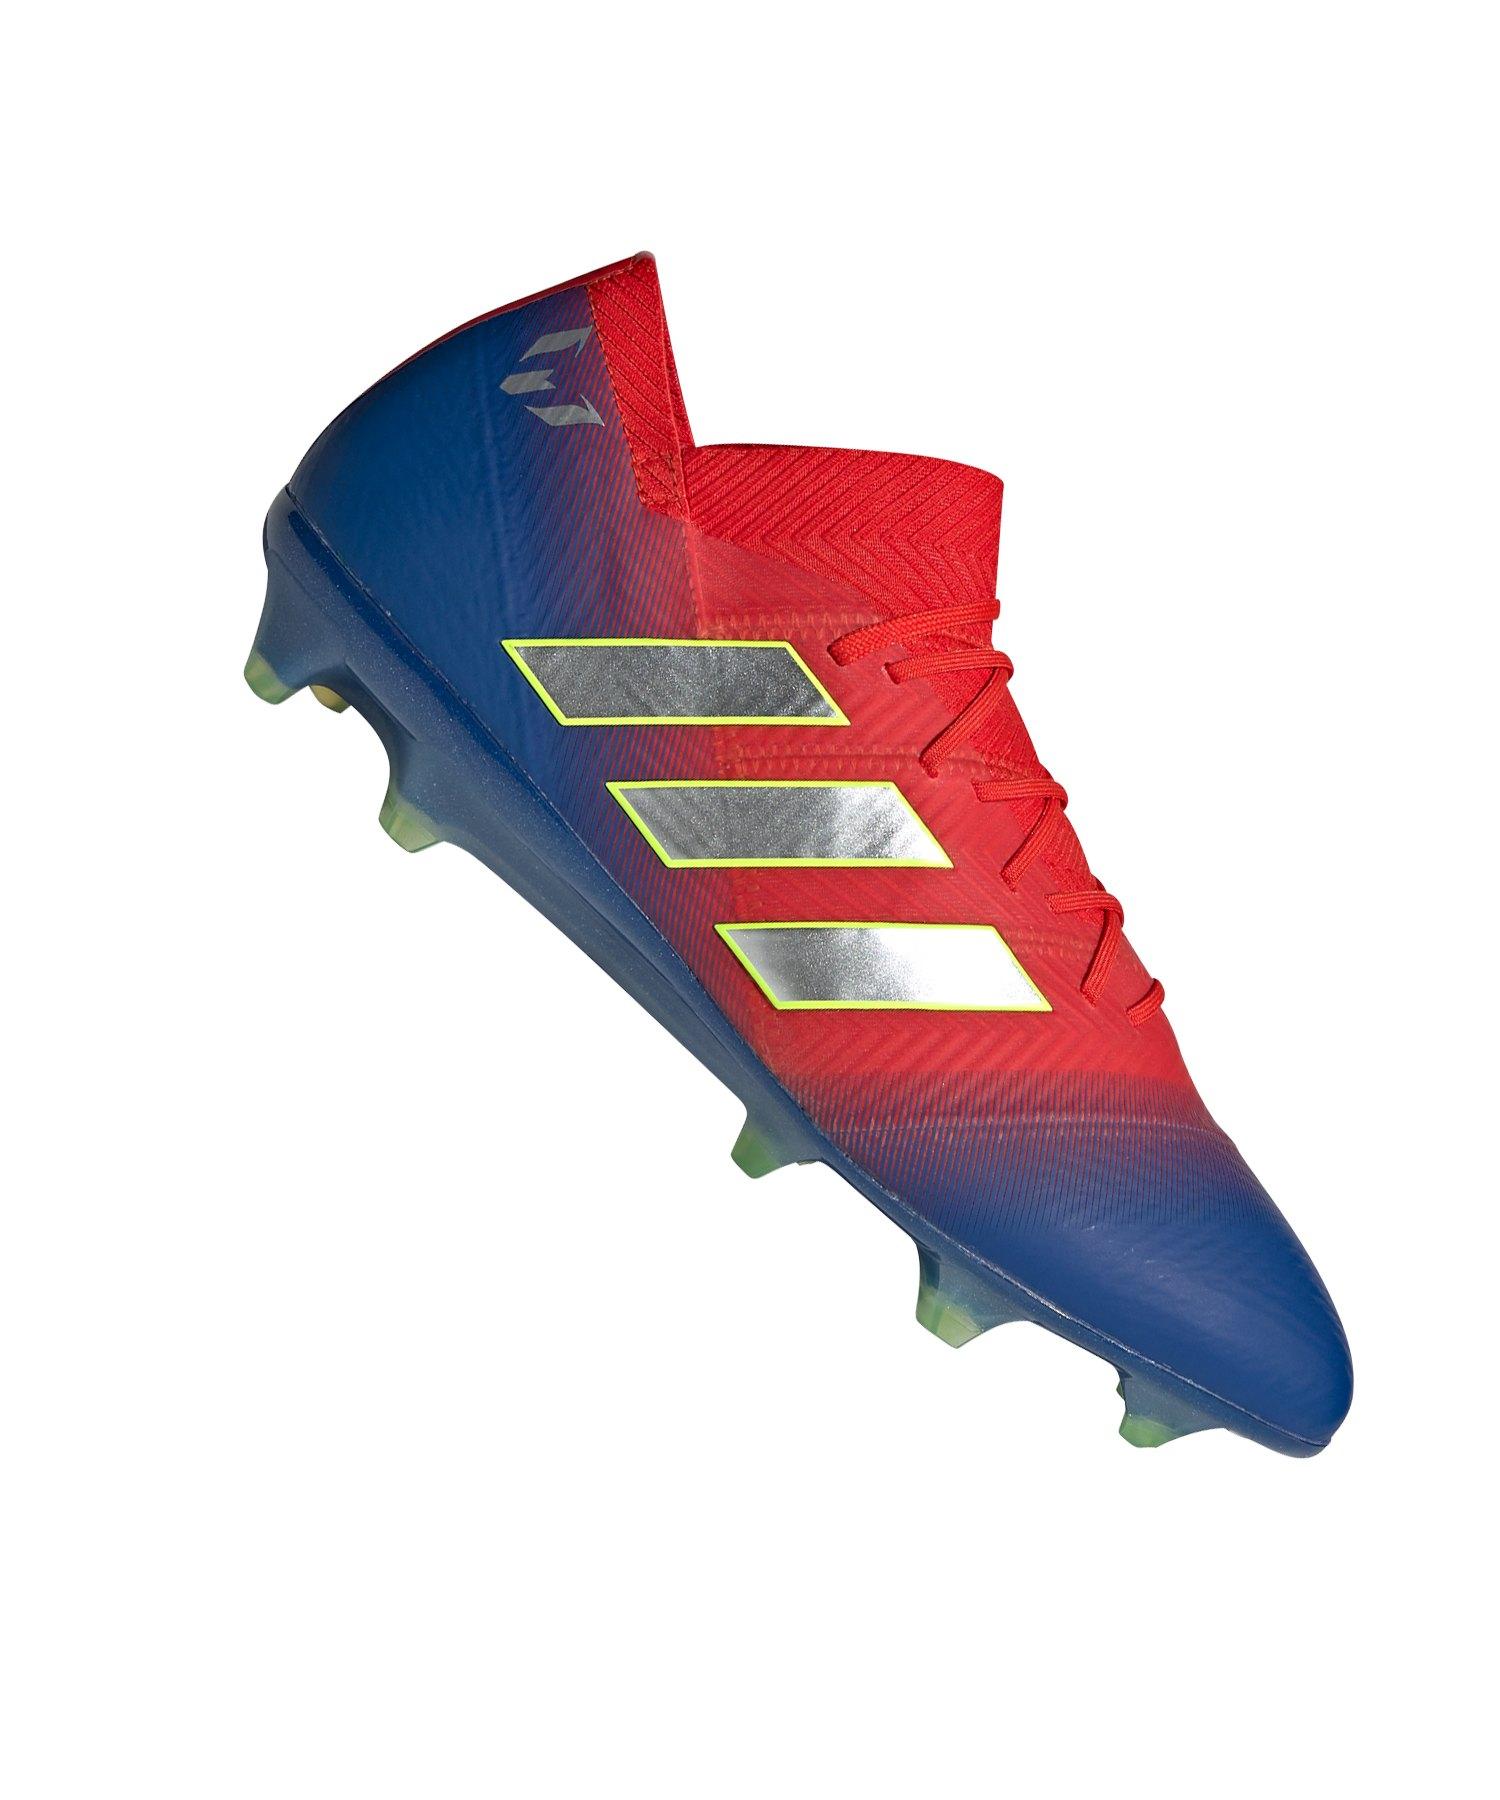 adidas NEMEZIZ Messi 18.1 FG Rot Blau - rot